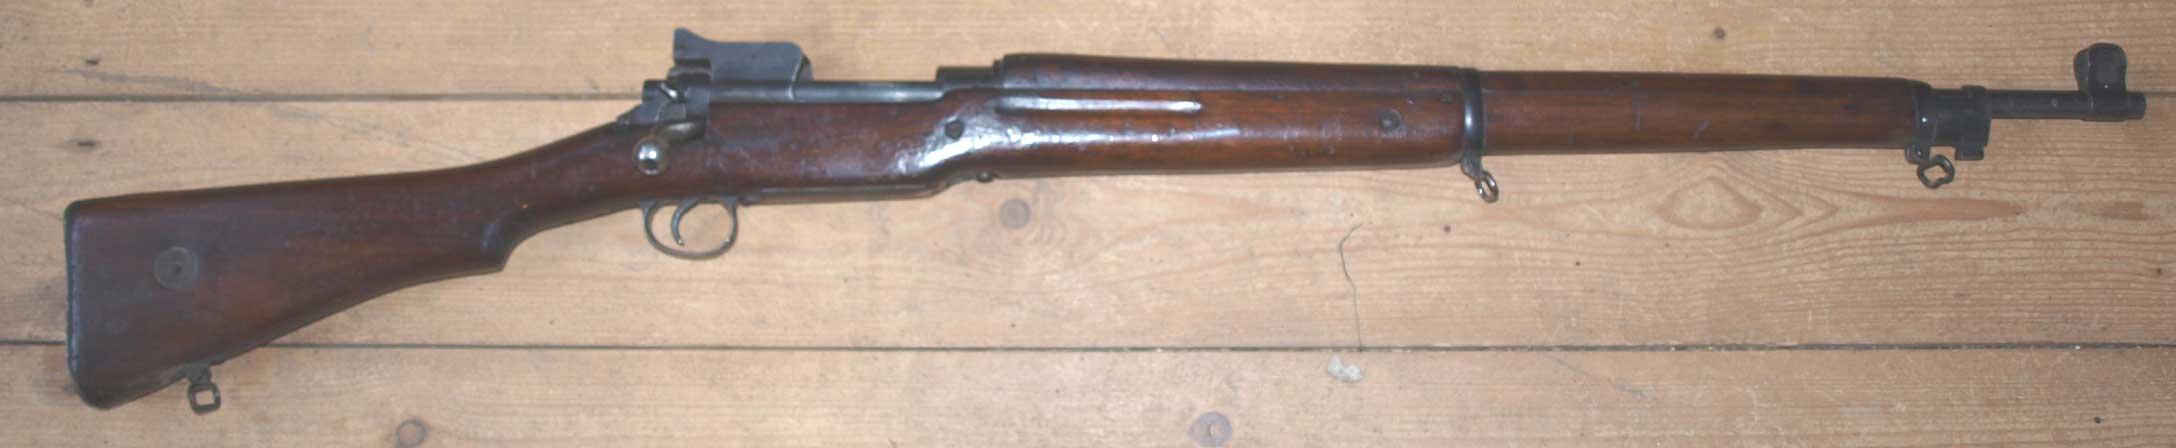 Enfield P14 & M17 rifles - The...